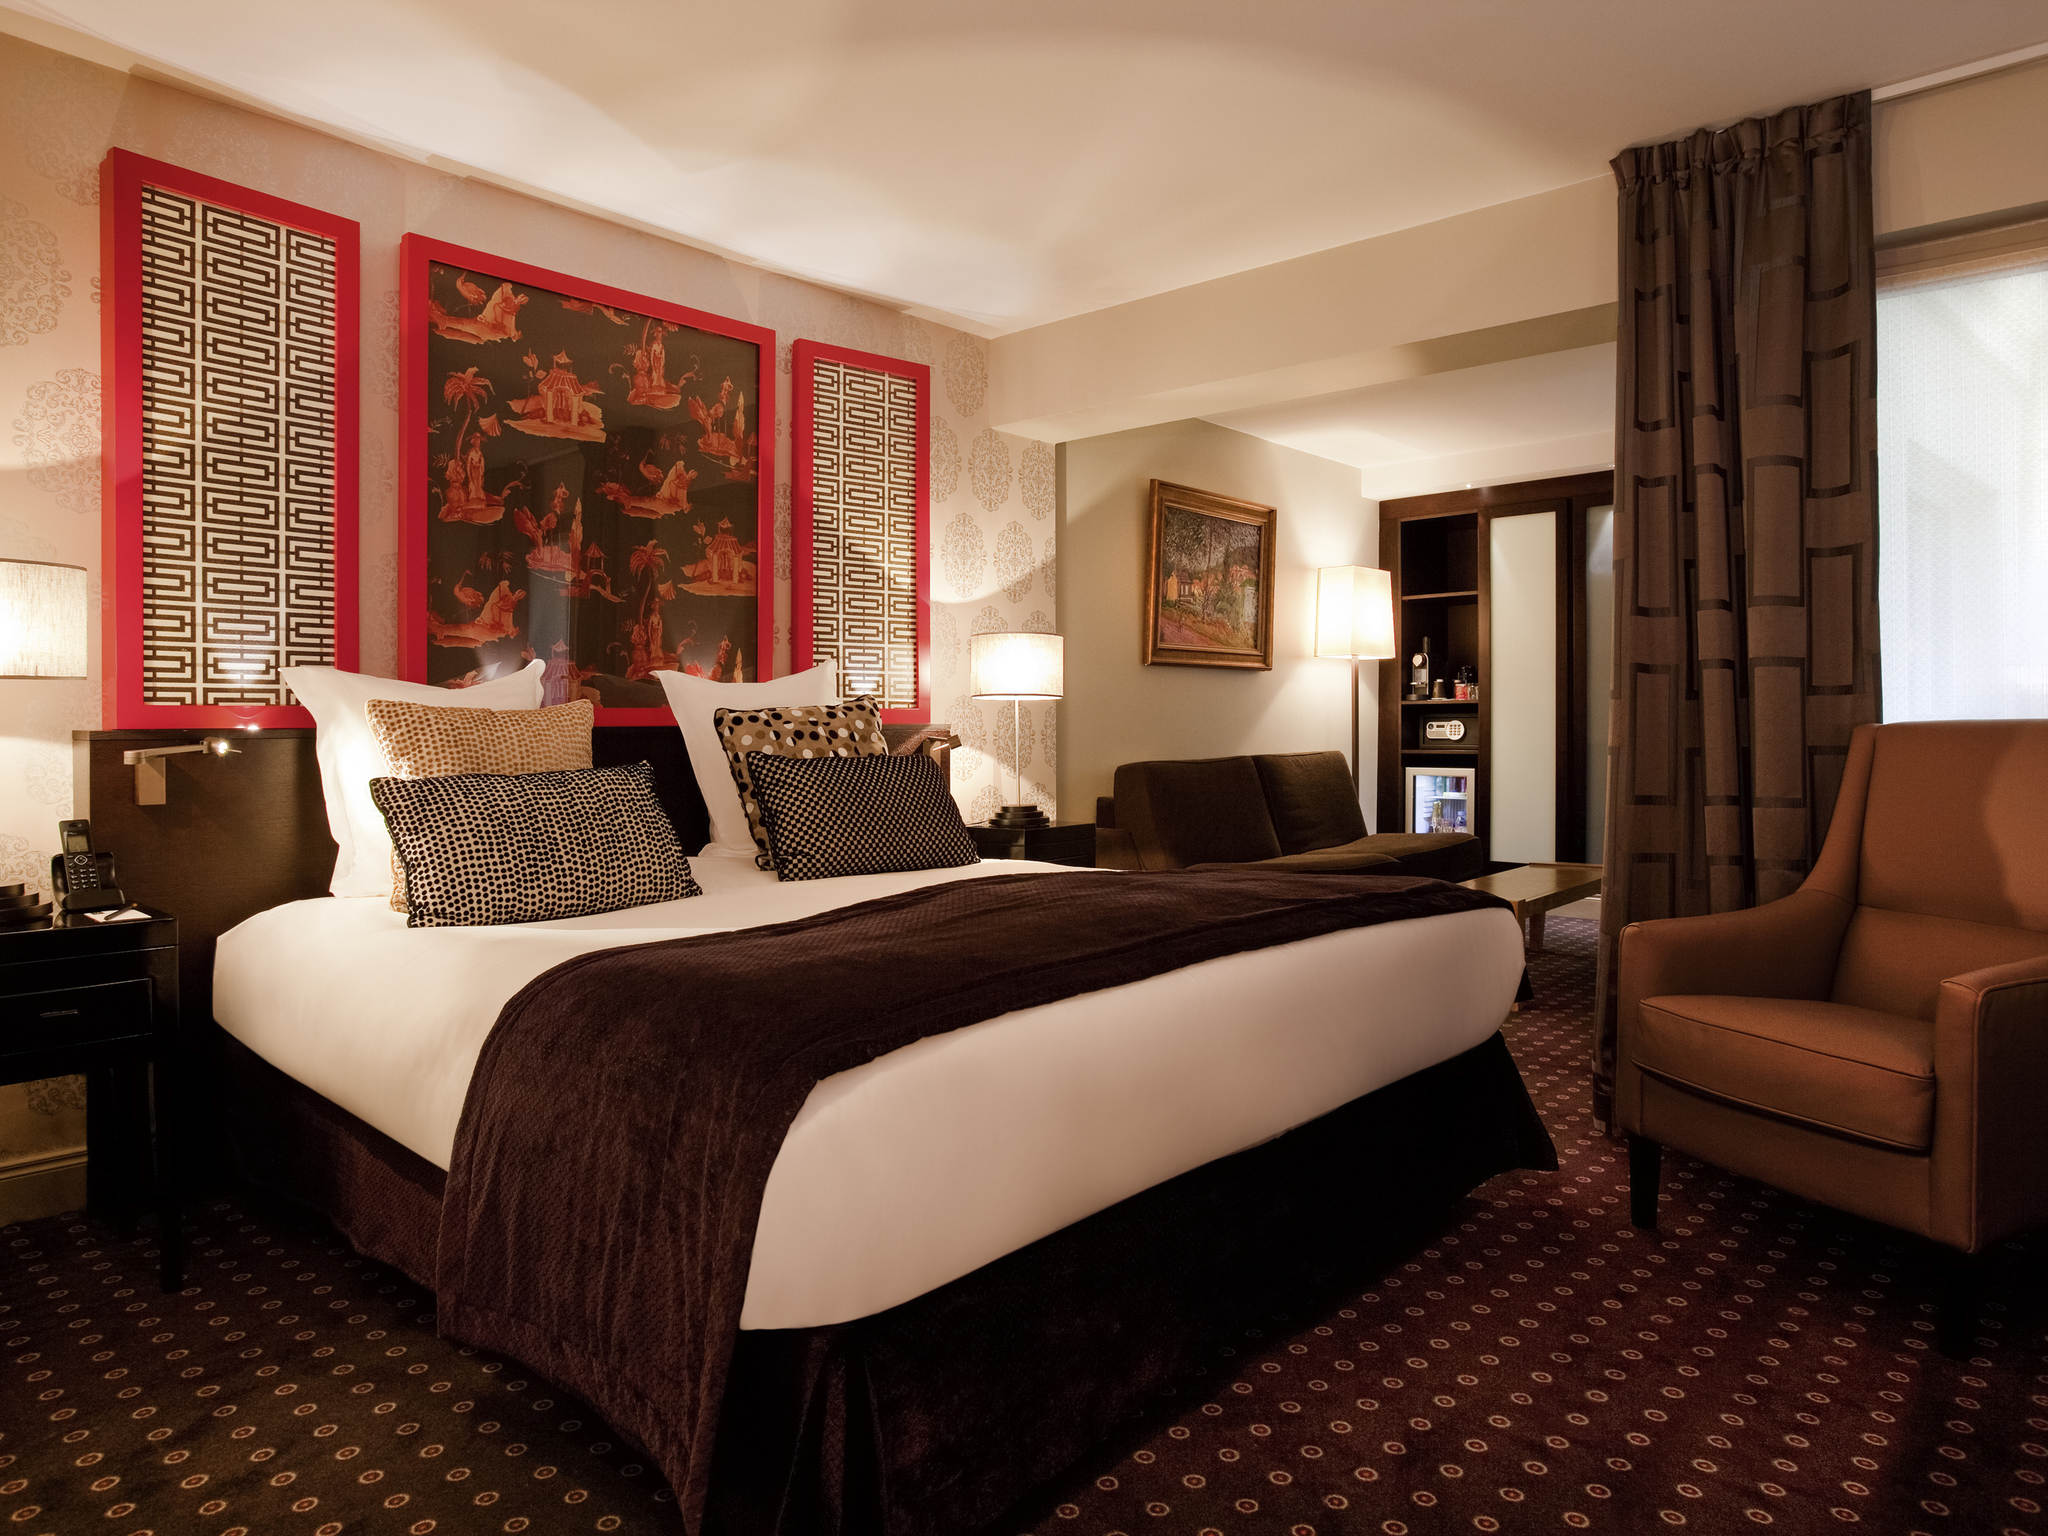 Hotel - Hôtel Stendhal Place Vendôme Paris - MGallery by Sofitel